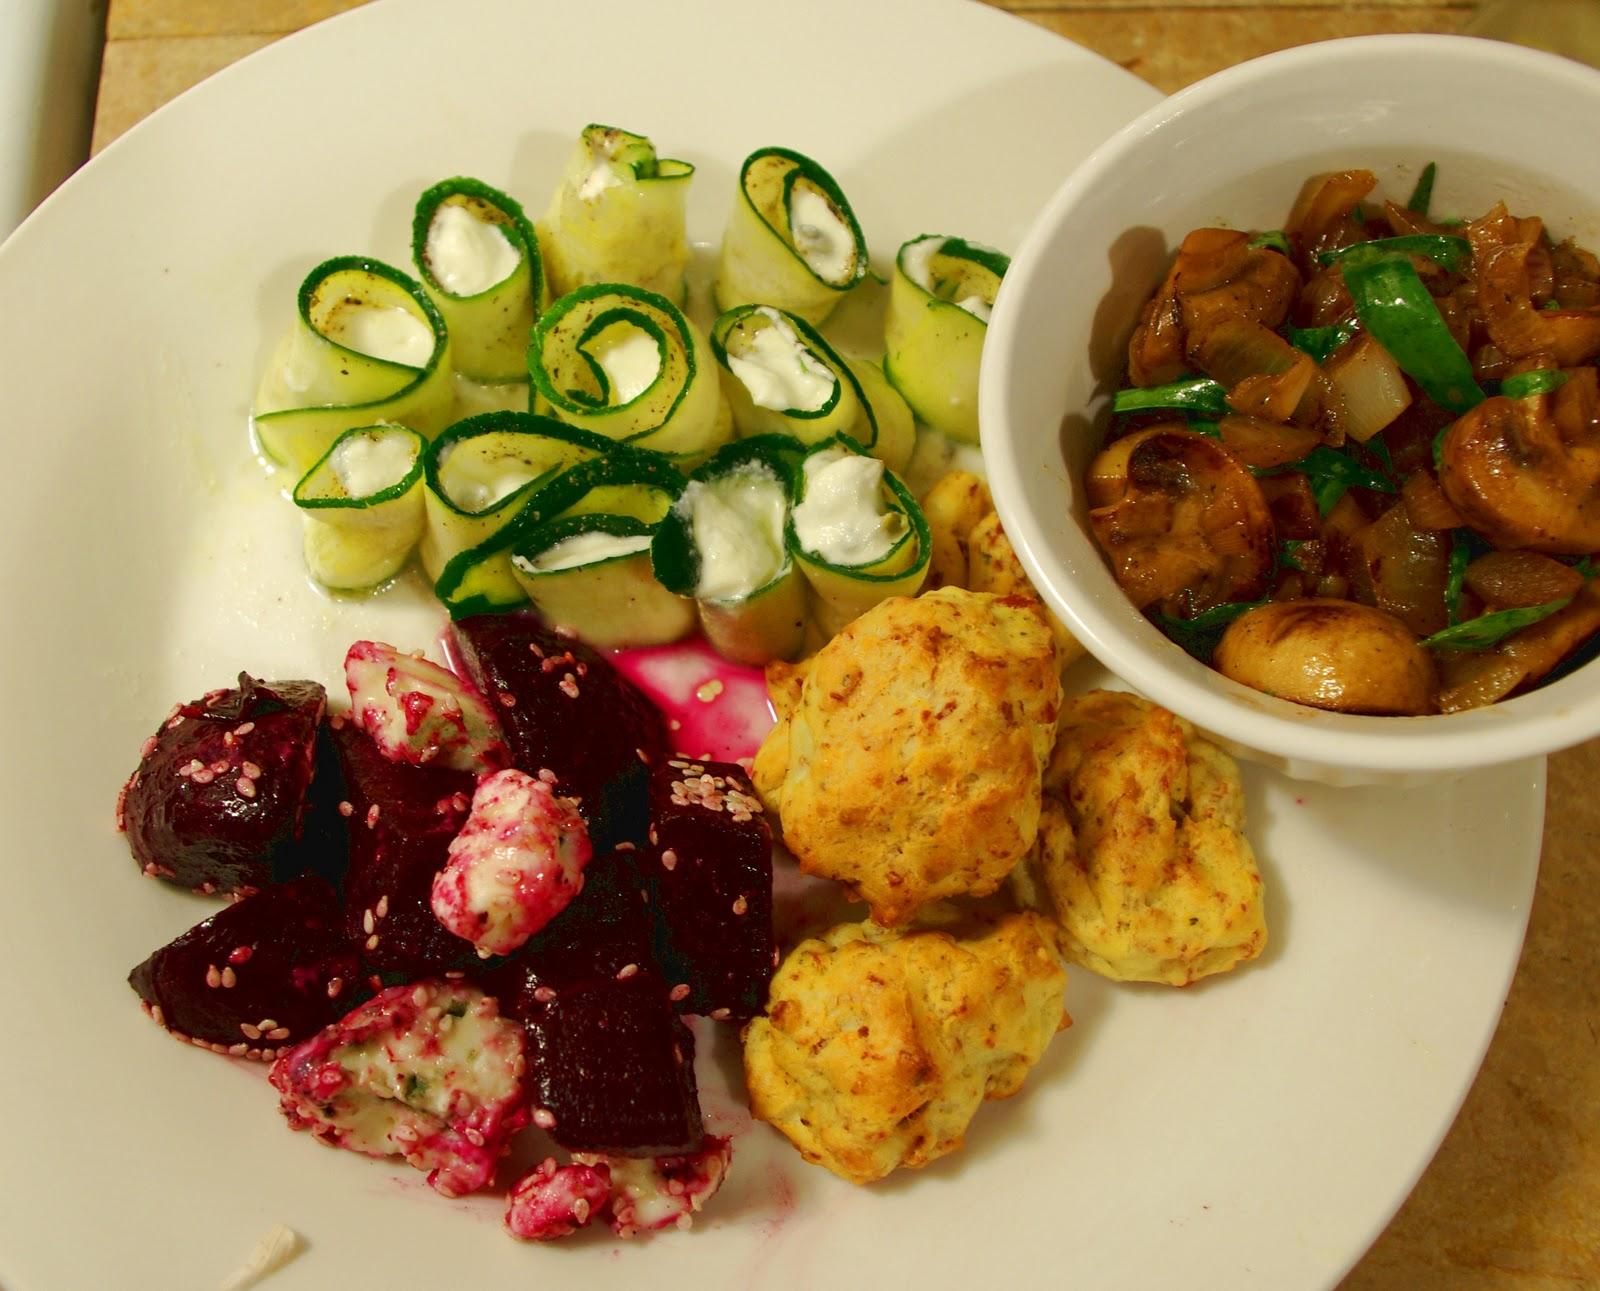 ... Roquefort) + Prosciutto, Sage & Parmesan Puffs + Marinated Mushrooms